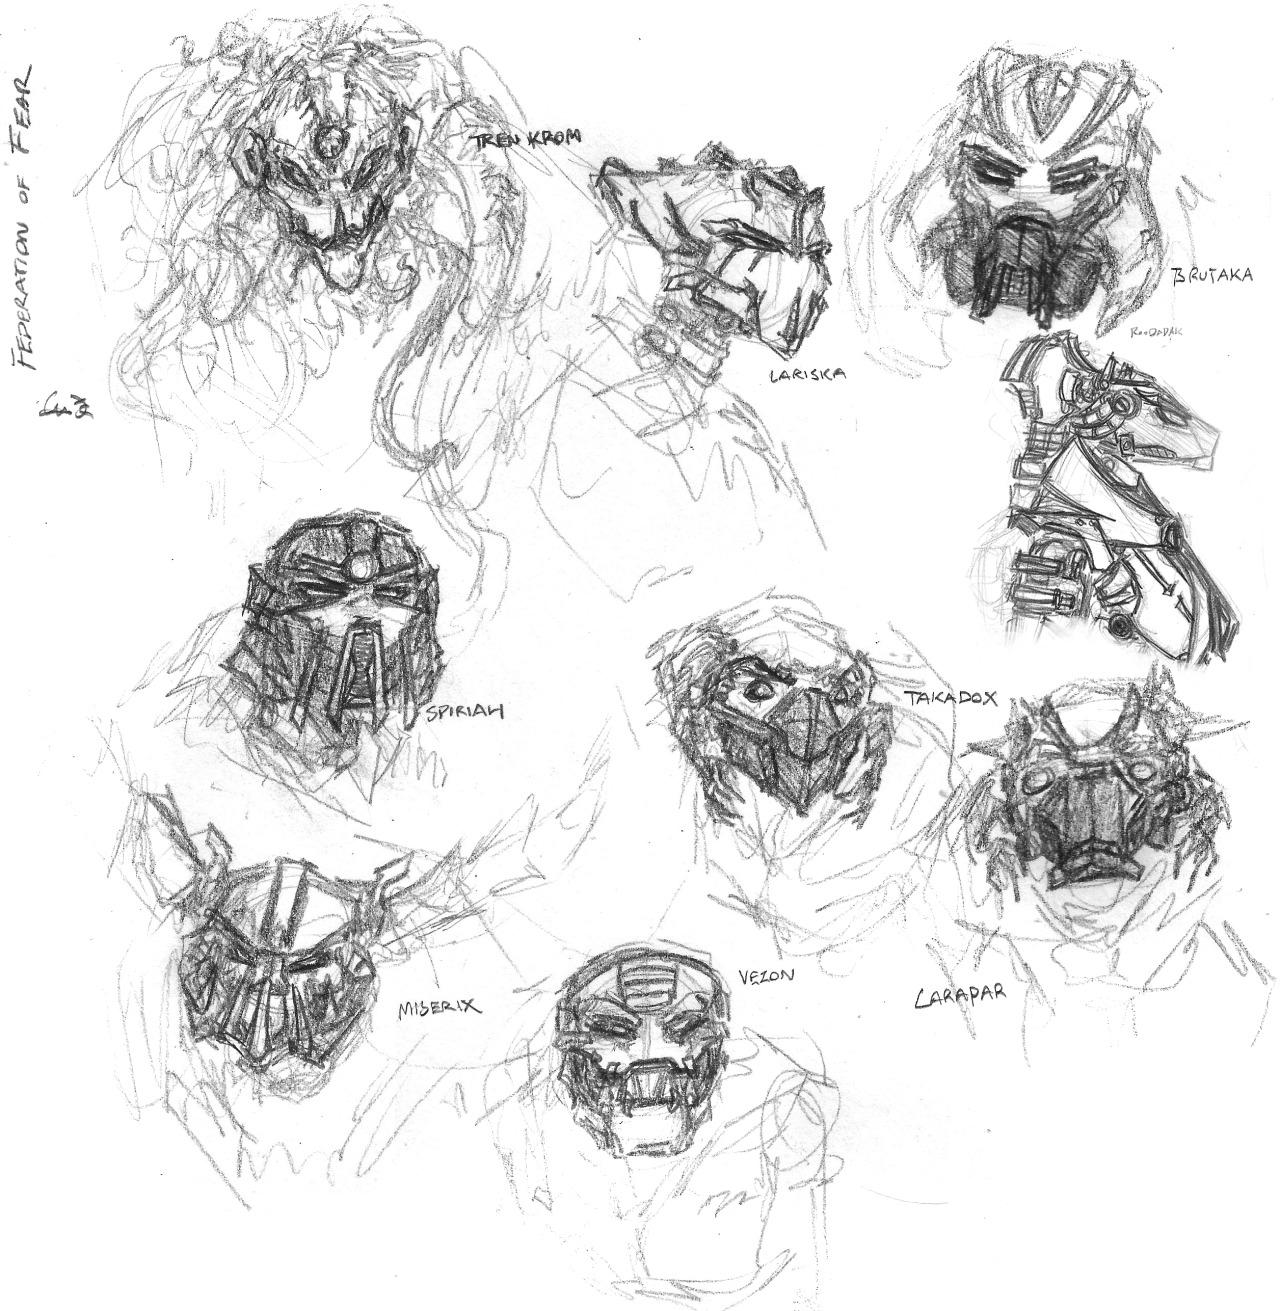 [Fan-Arts] Images du net - Page 20 Tumblr_n1ryqkNYtx1ry123oo1_1280